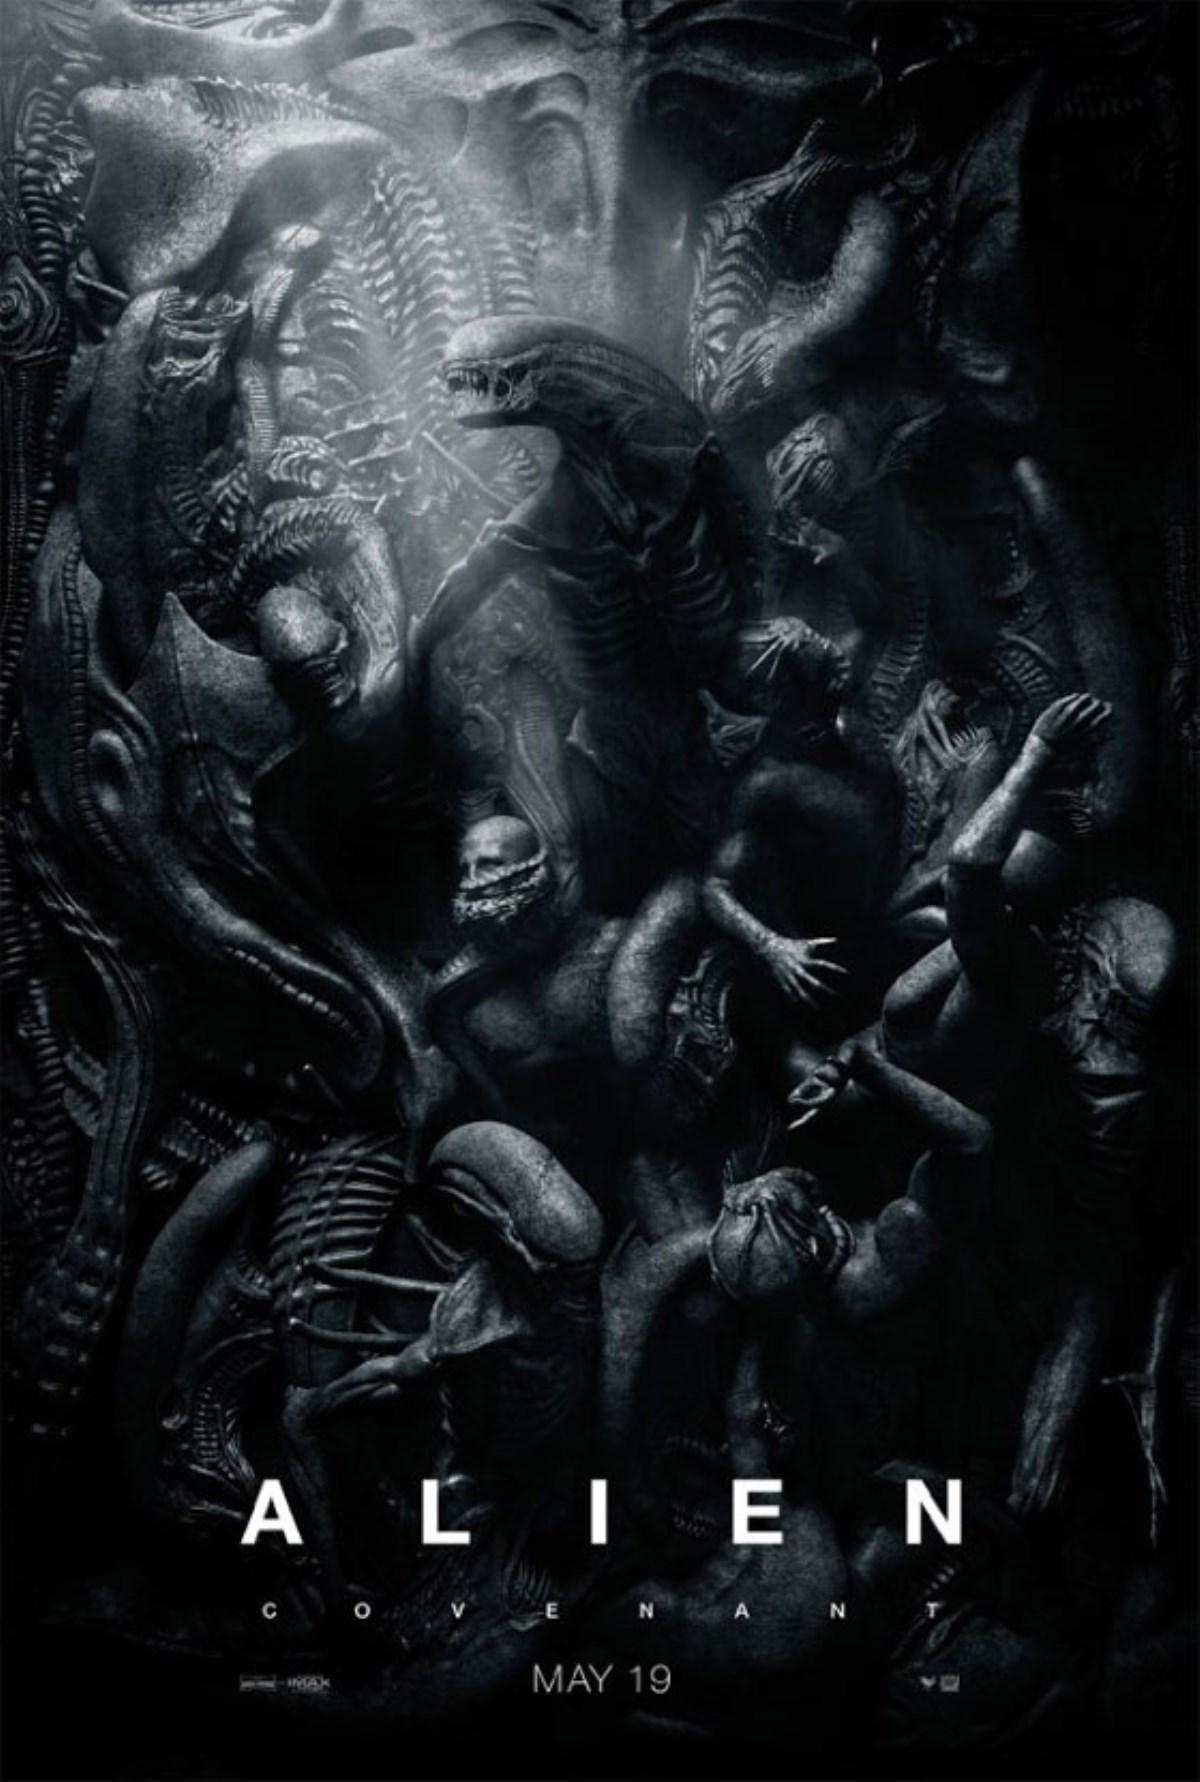 بیگانه : عهد ( Alien: Covenant )